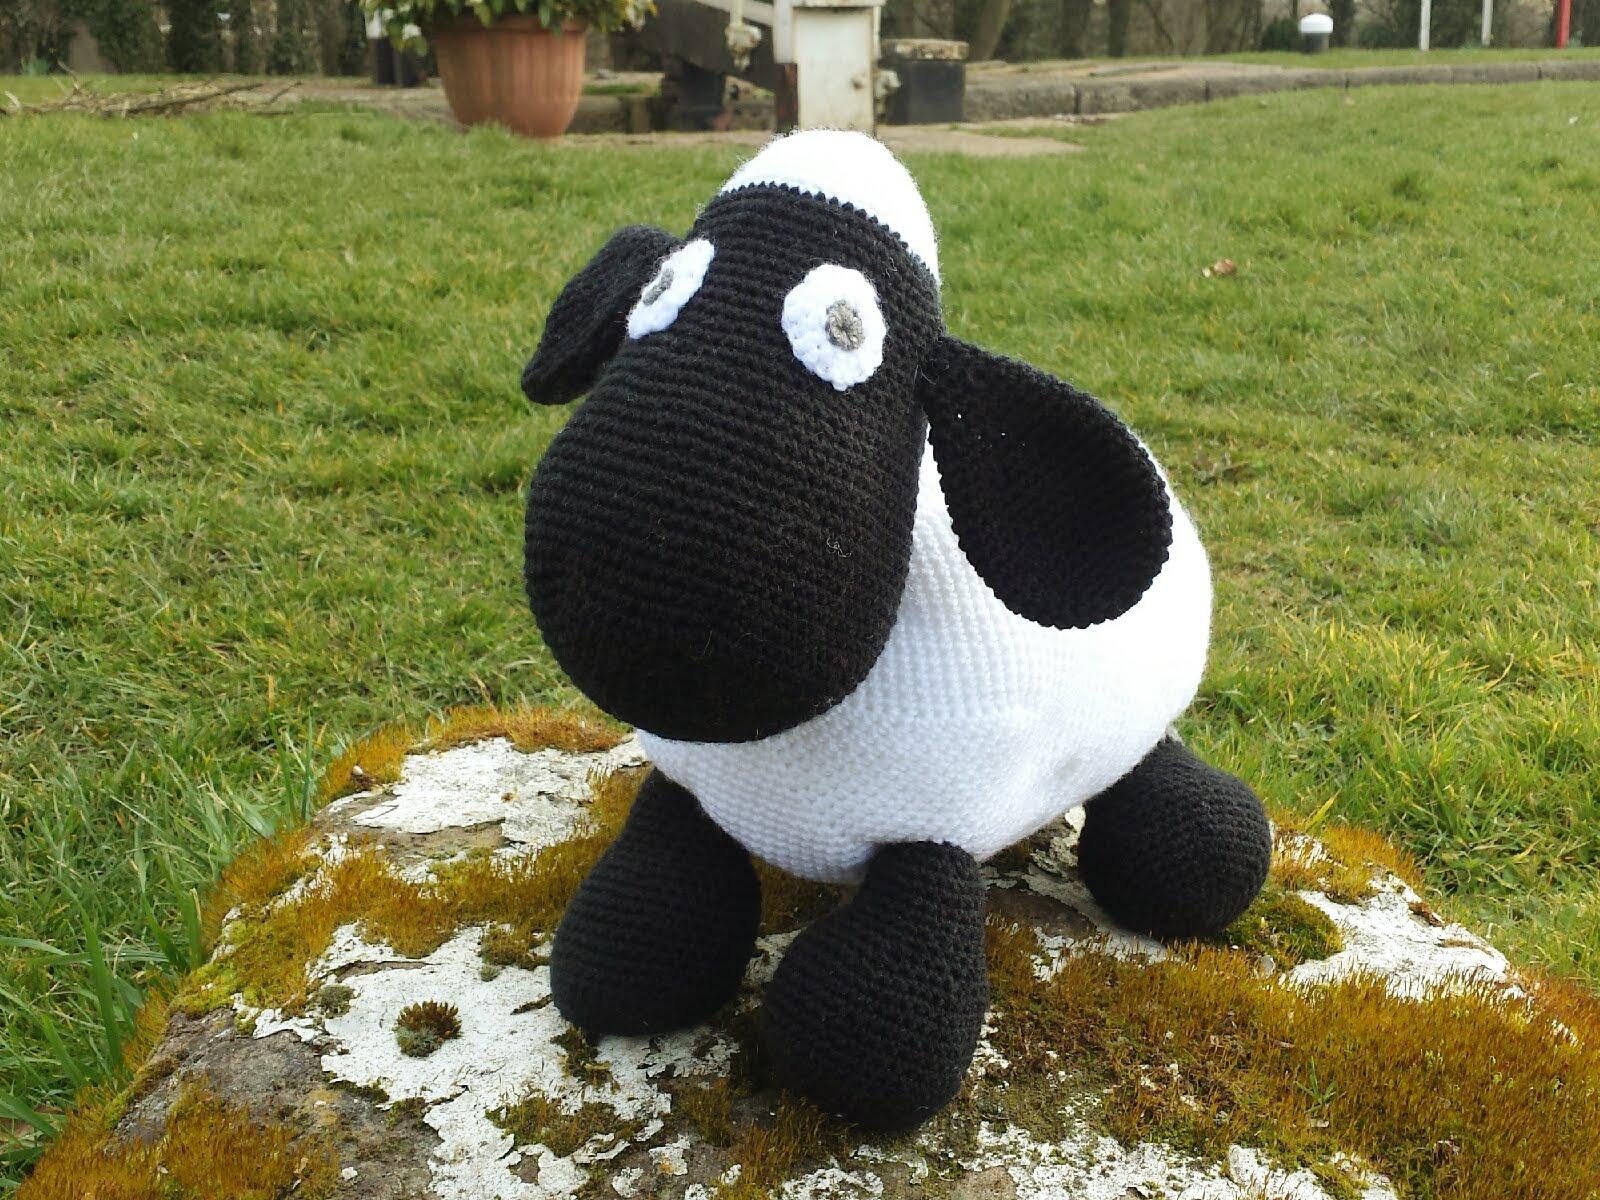 Amigurumi Crochet Meaning : Amigurumi black cat u free crochet pattern u tillysome patterns